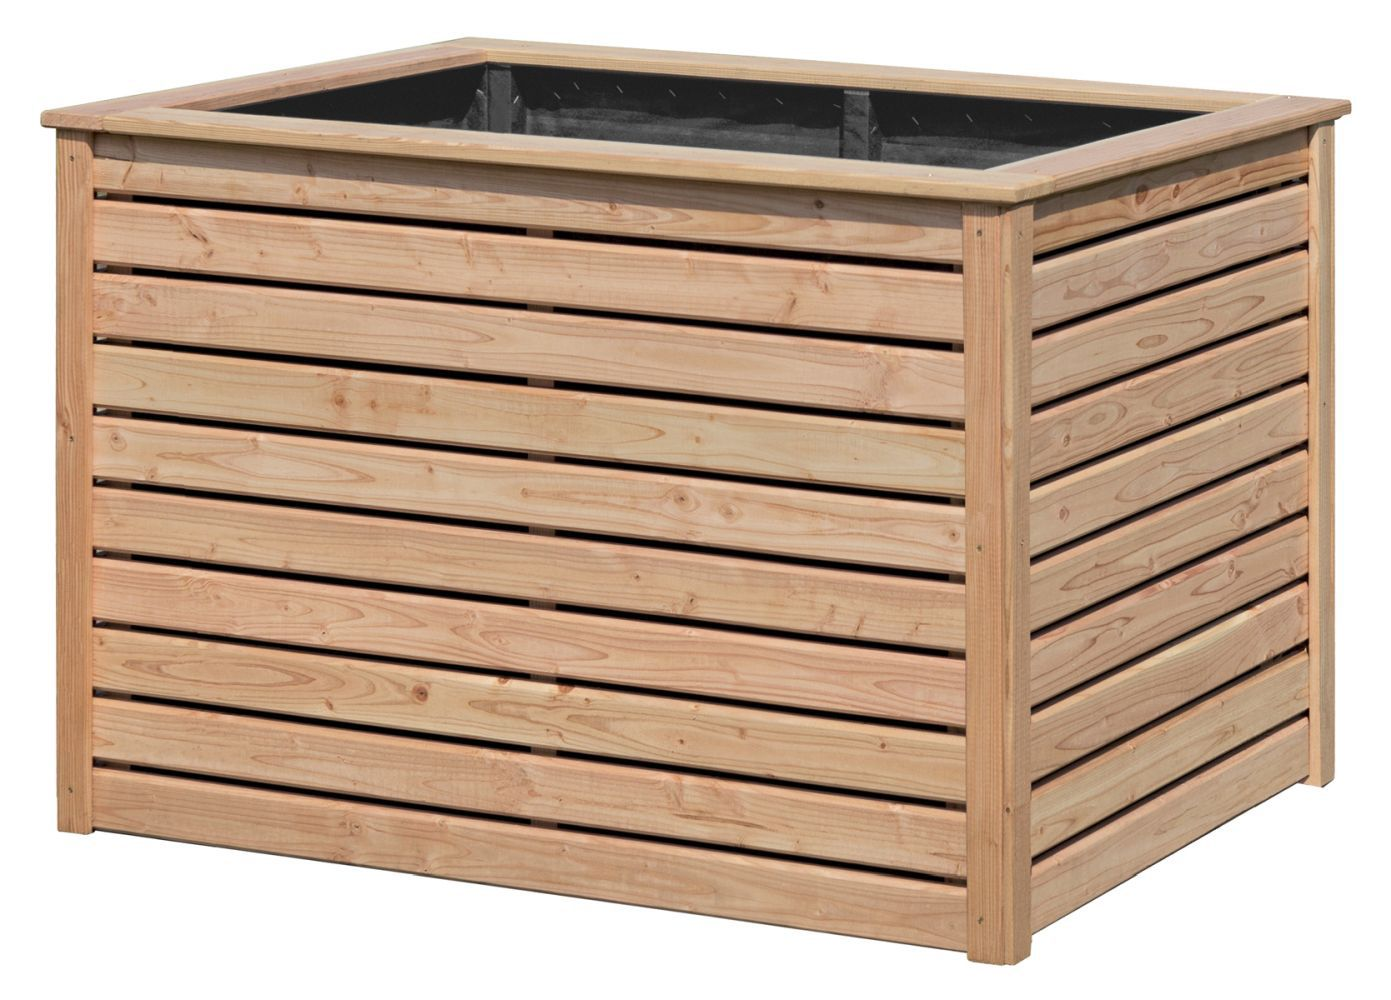 Verhoogd groente bed tuin 02 - gemaakt van Larikshout, FSC® - afmetingen: 125 x 85 x 80 cm (B x D x H)